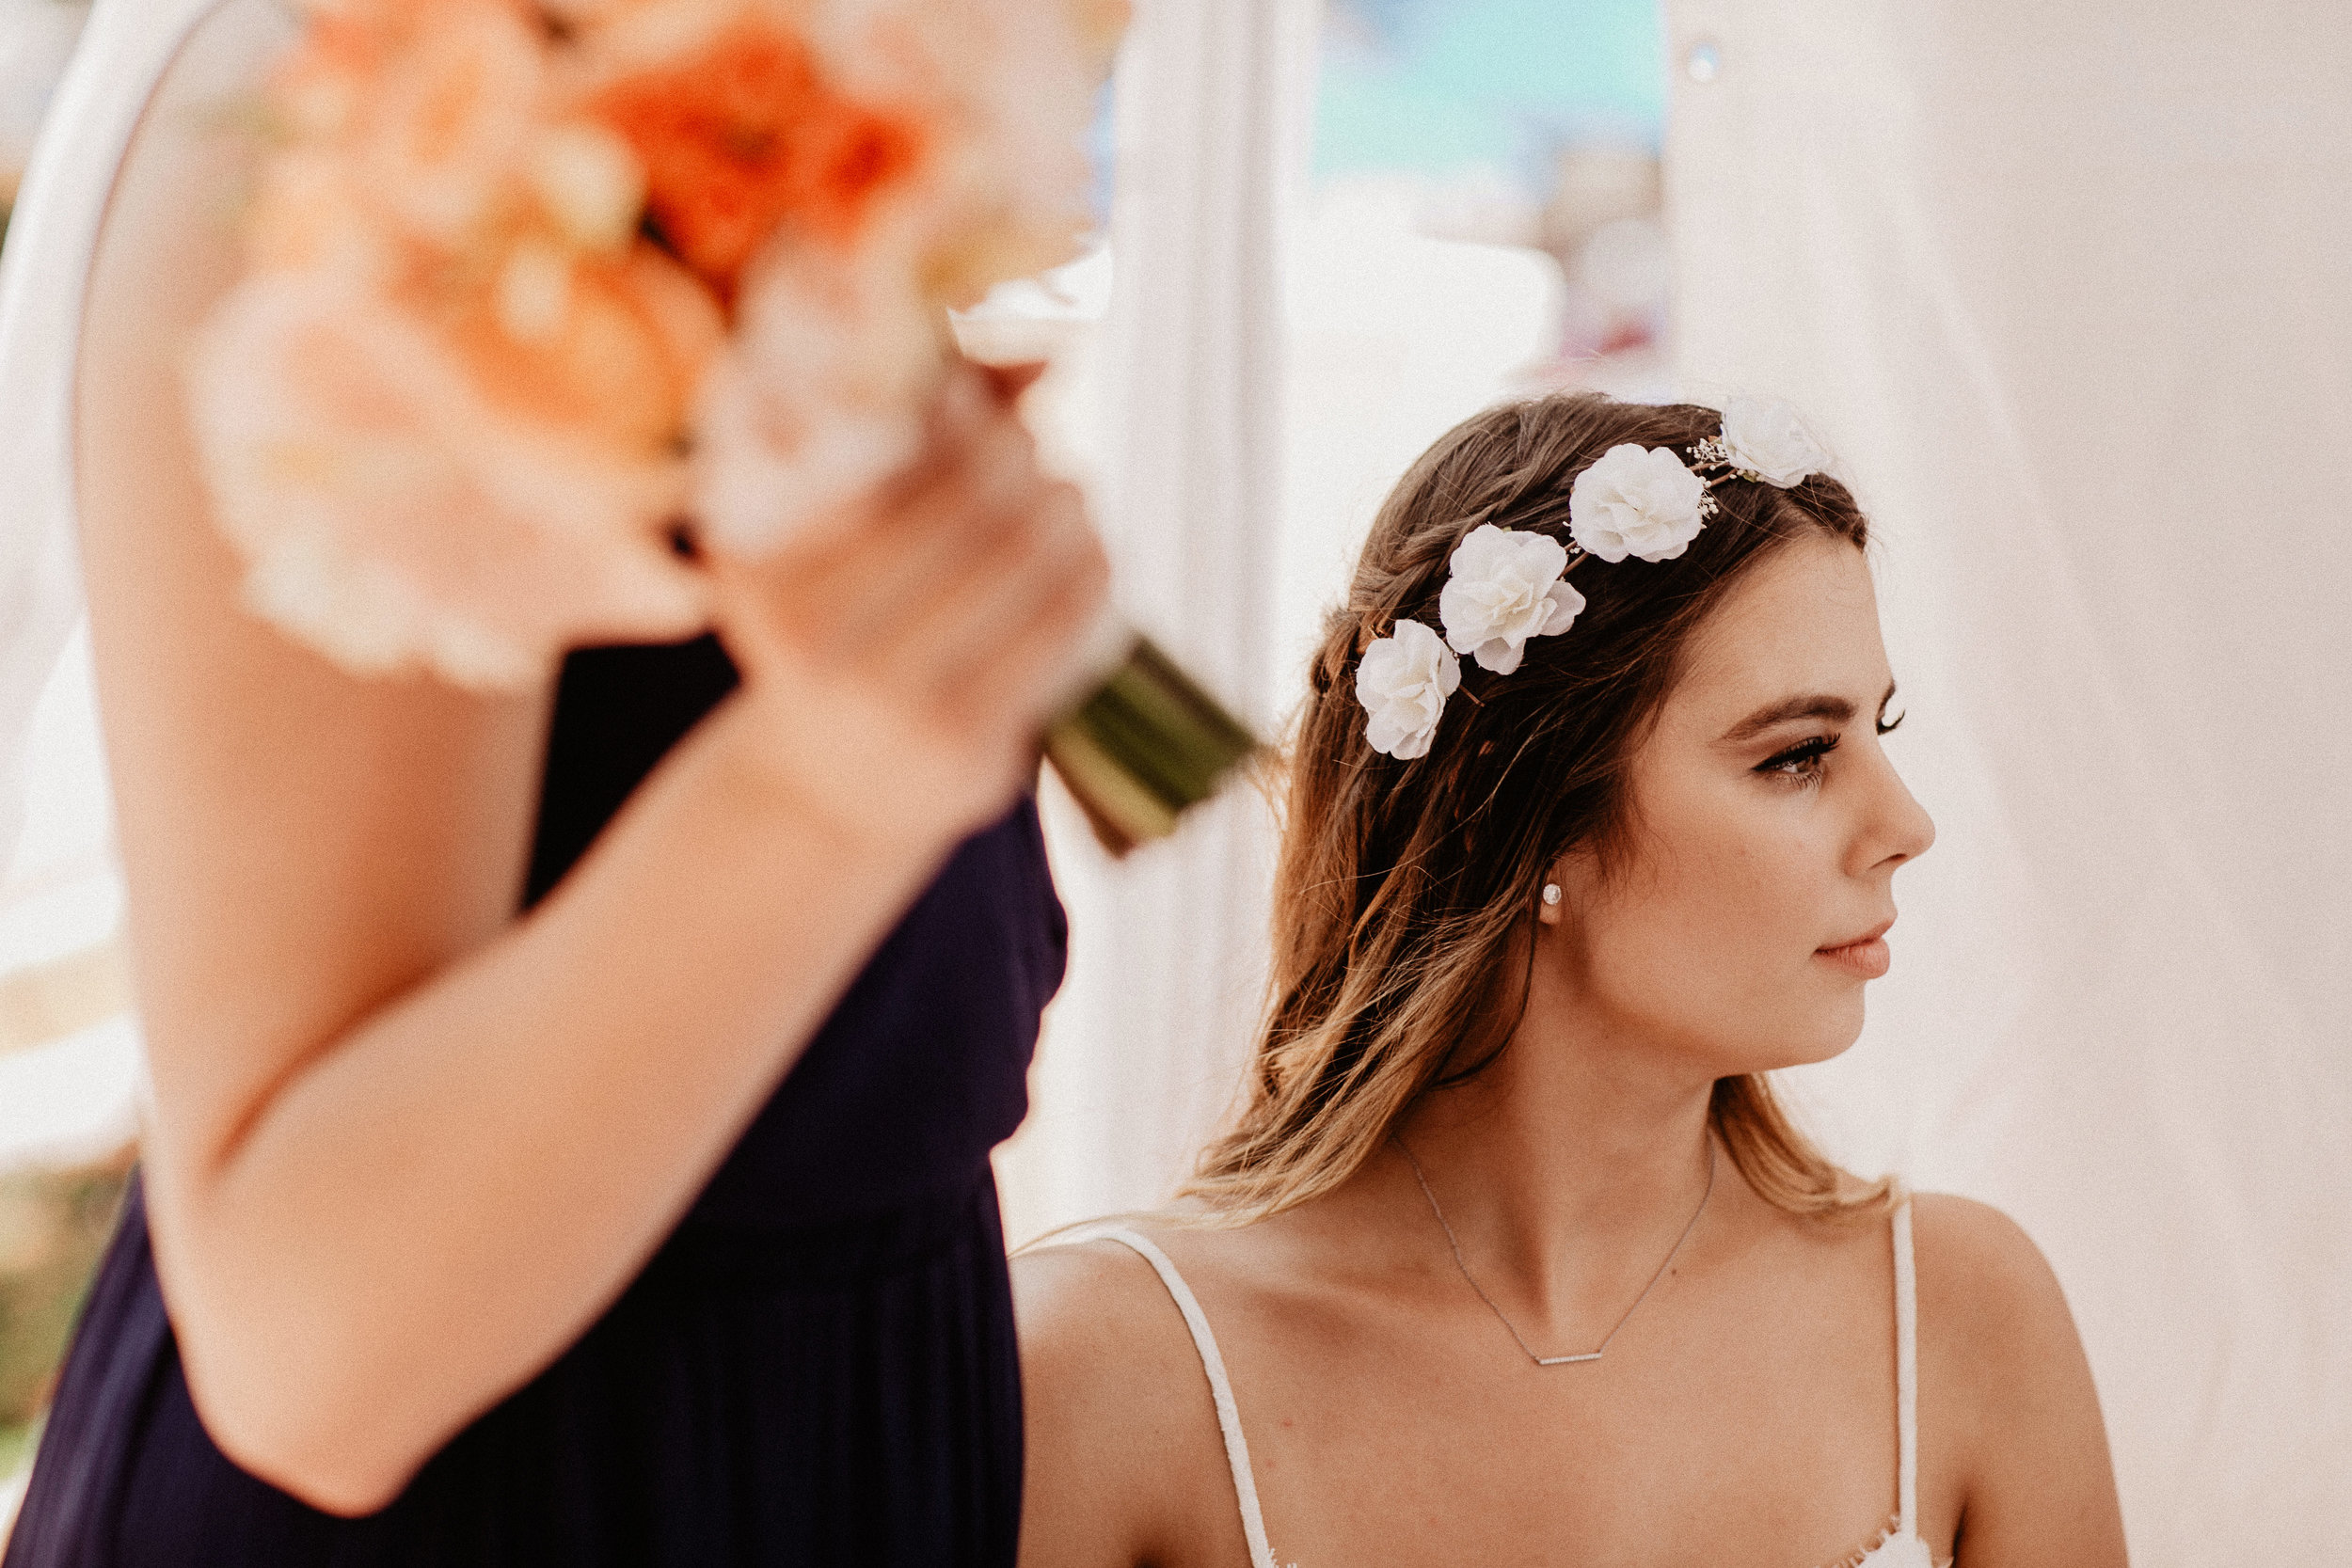 alfonso_flores_destination_wedding_photography_puerto_vallarta_hotel_barcelo_vallarta_cuttler_amela-341.JPG